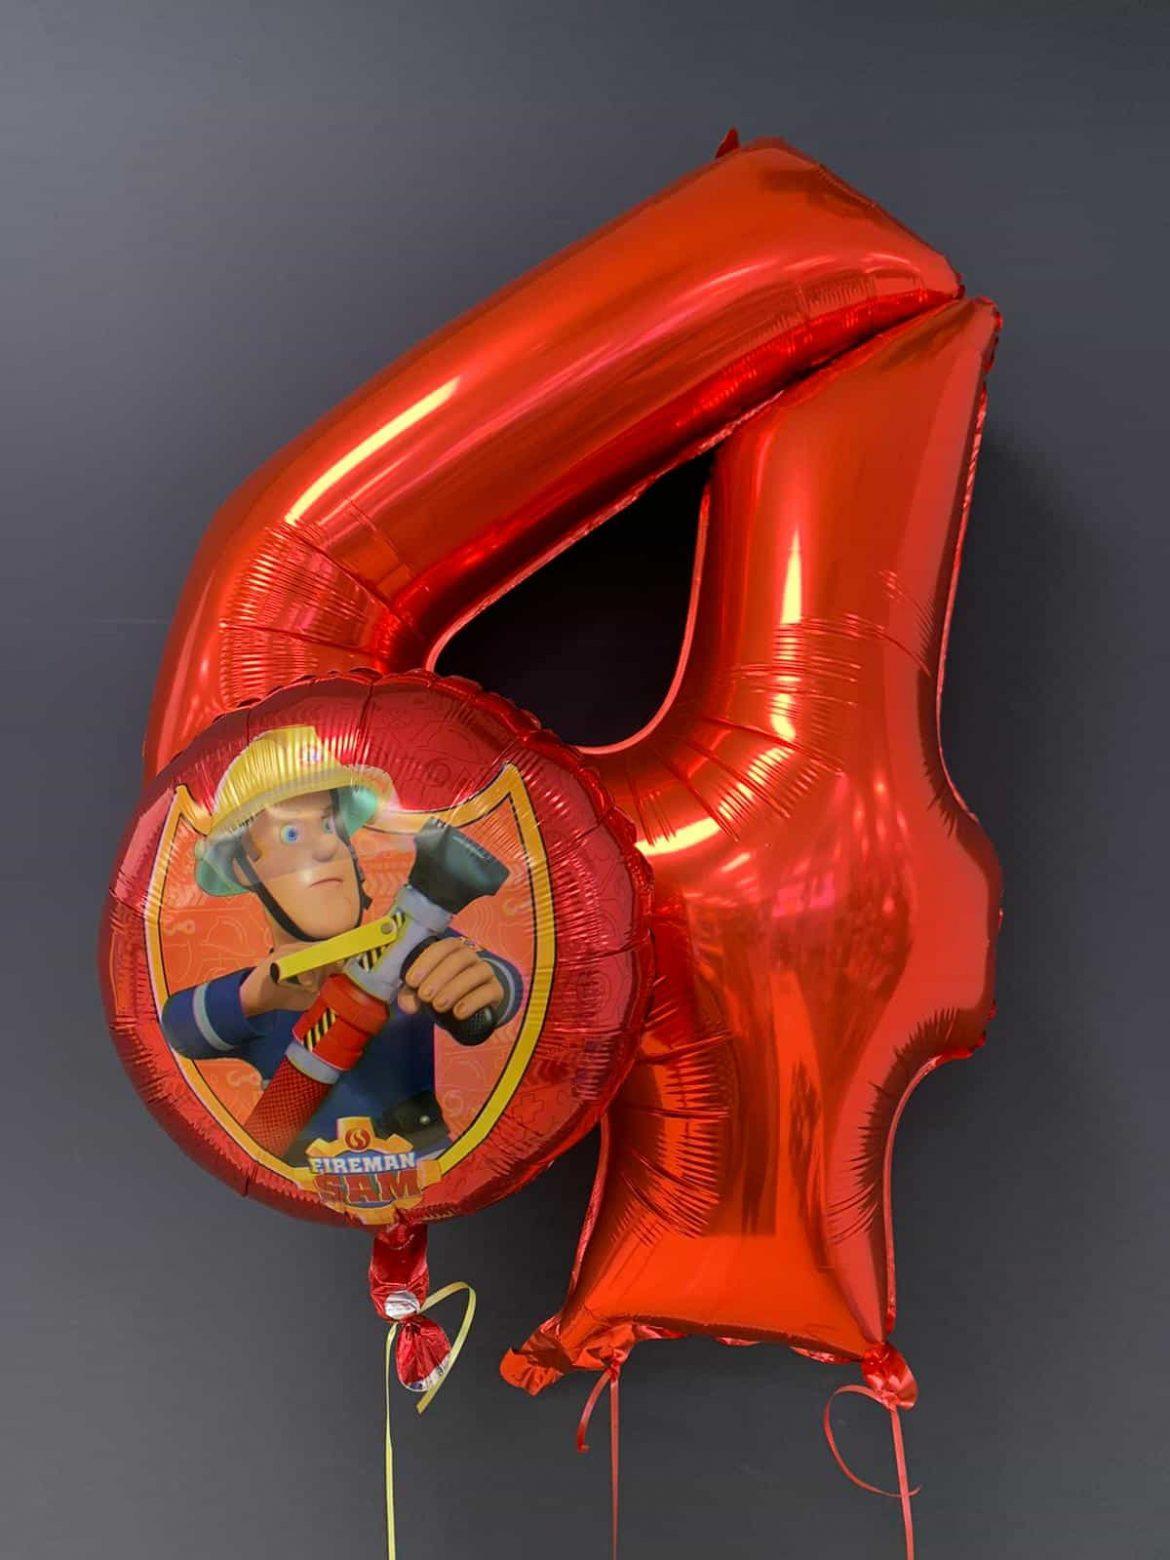 Feuerwehrmann Sam € 5,50<br />Zahlenballon € 9,90 1